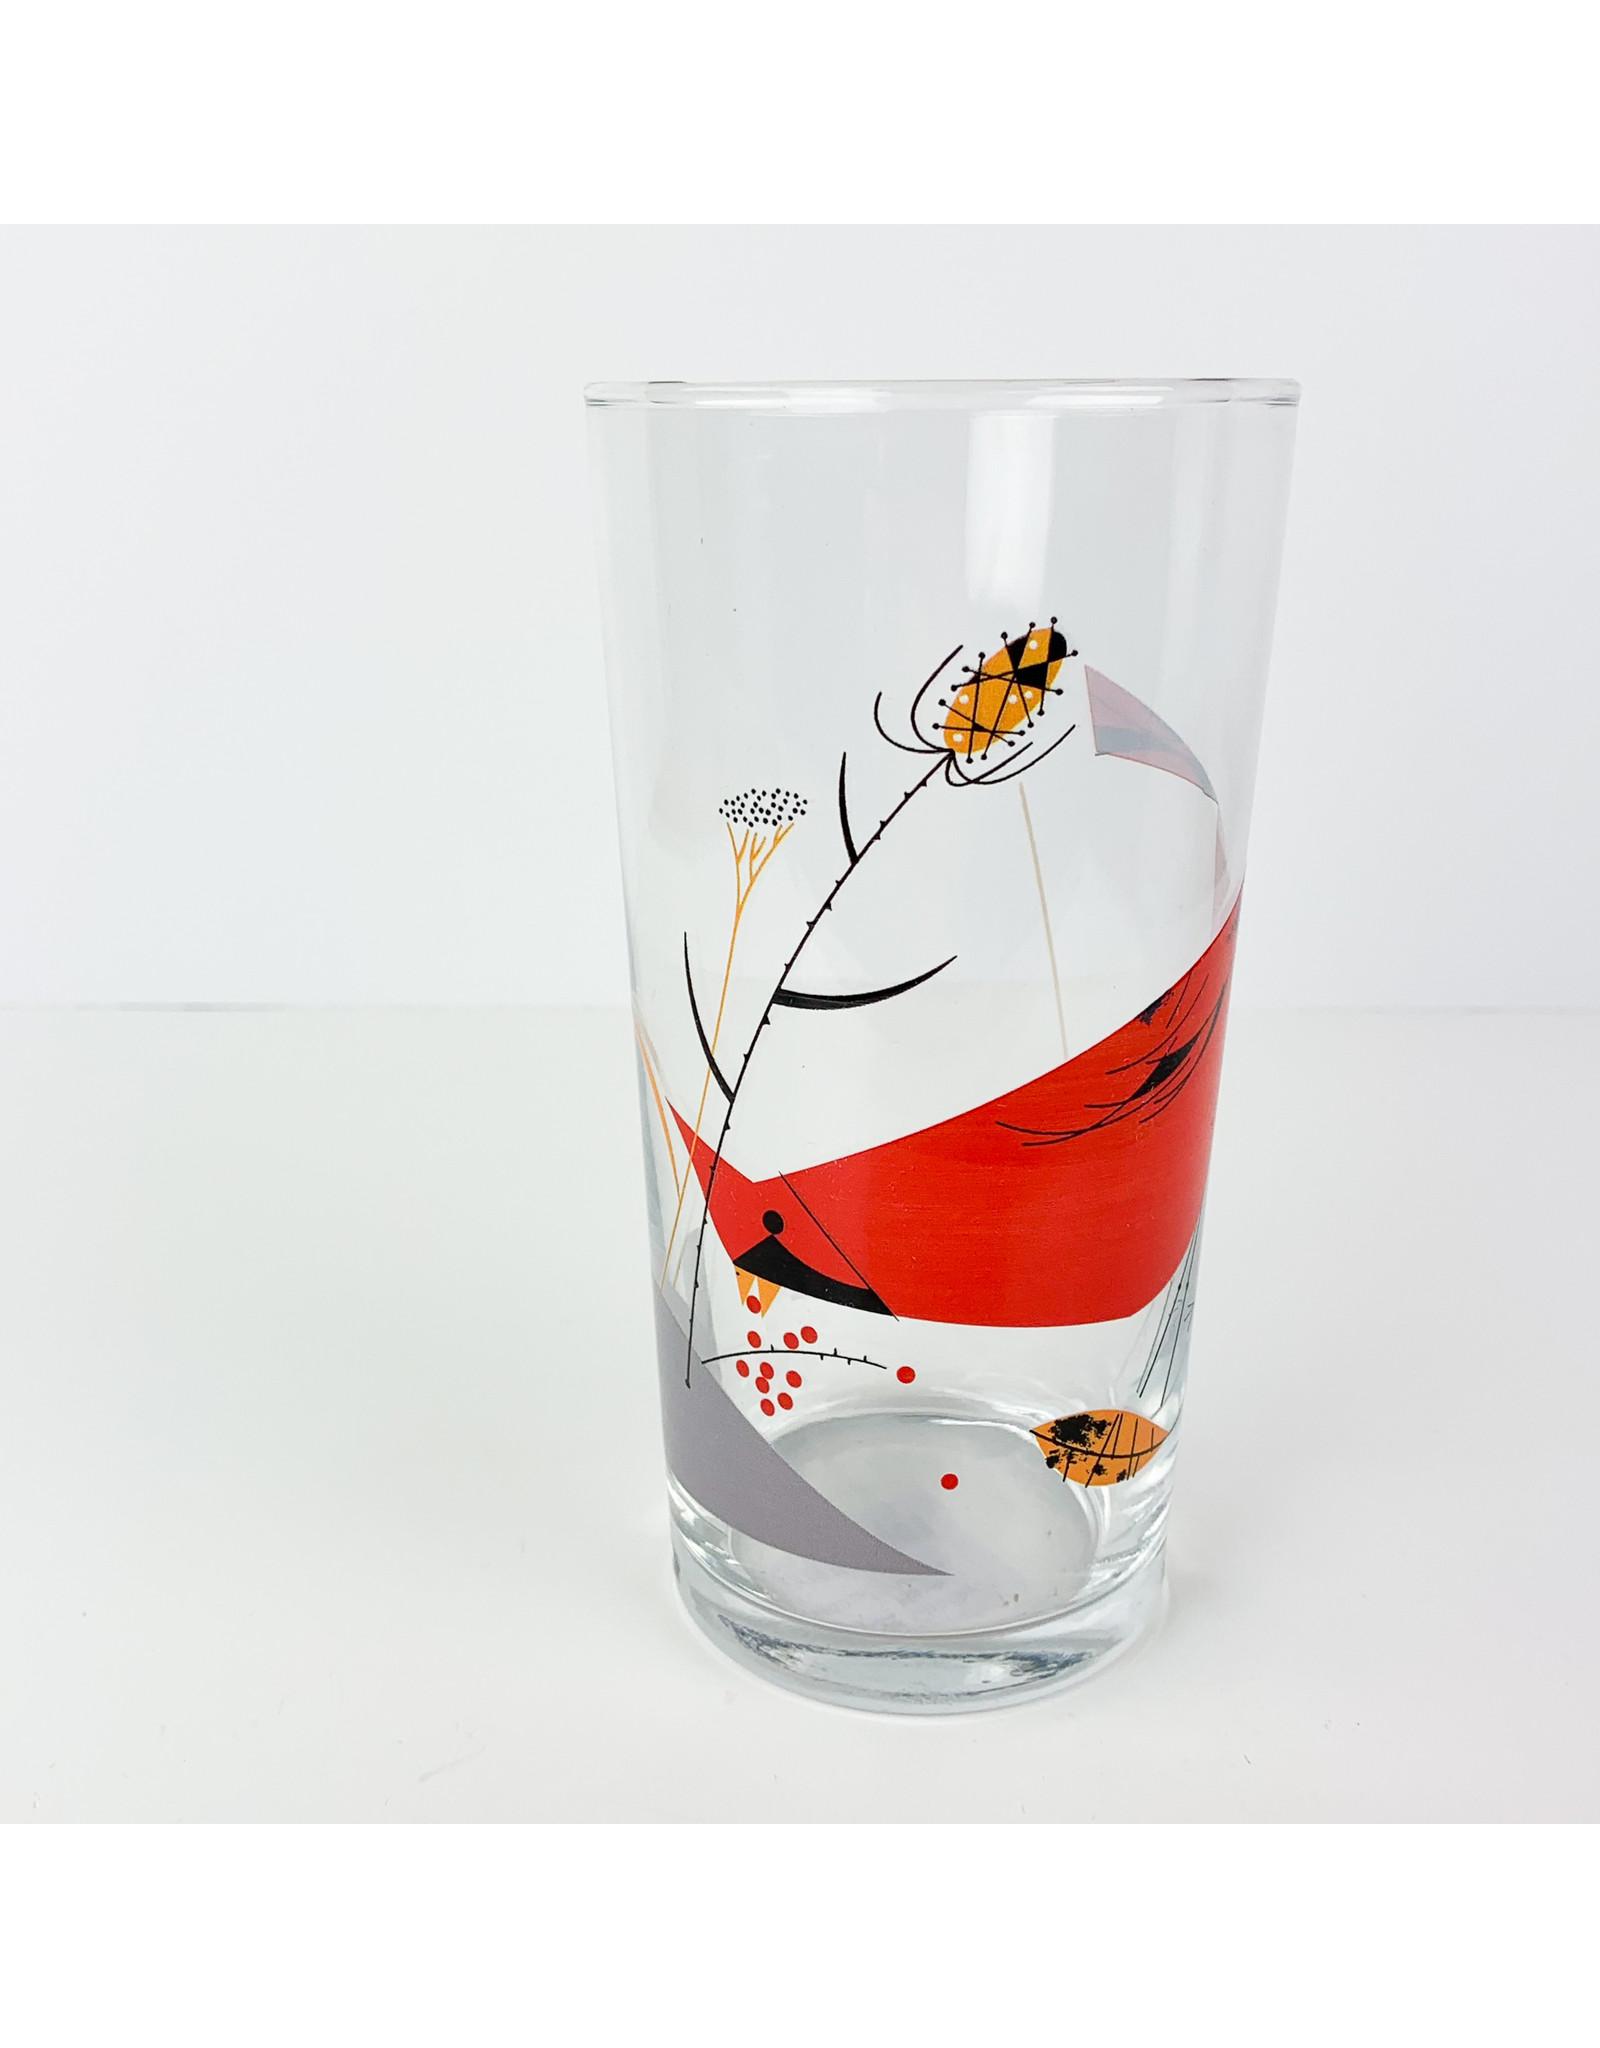 Charley Harper Art Studio Charley Harper Cardinal Glasses